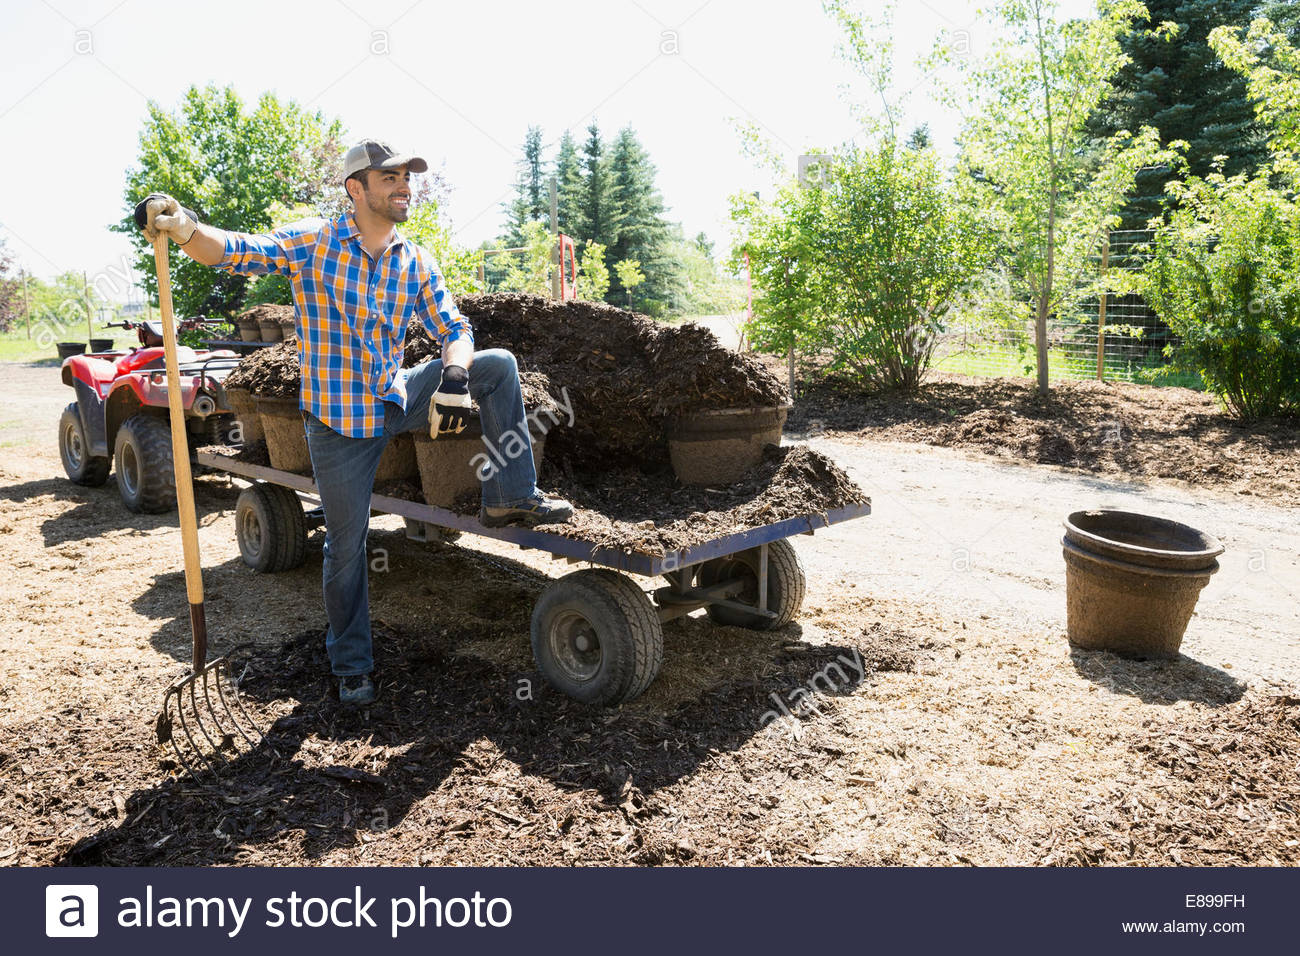 Smiling worker tilling dirt in garden - Stock Image